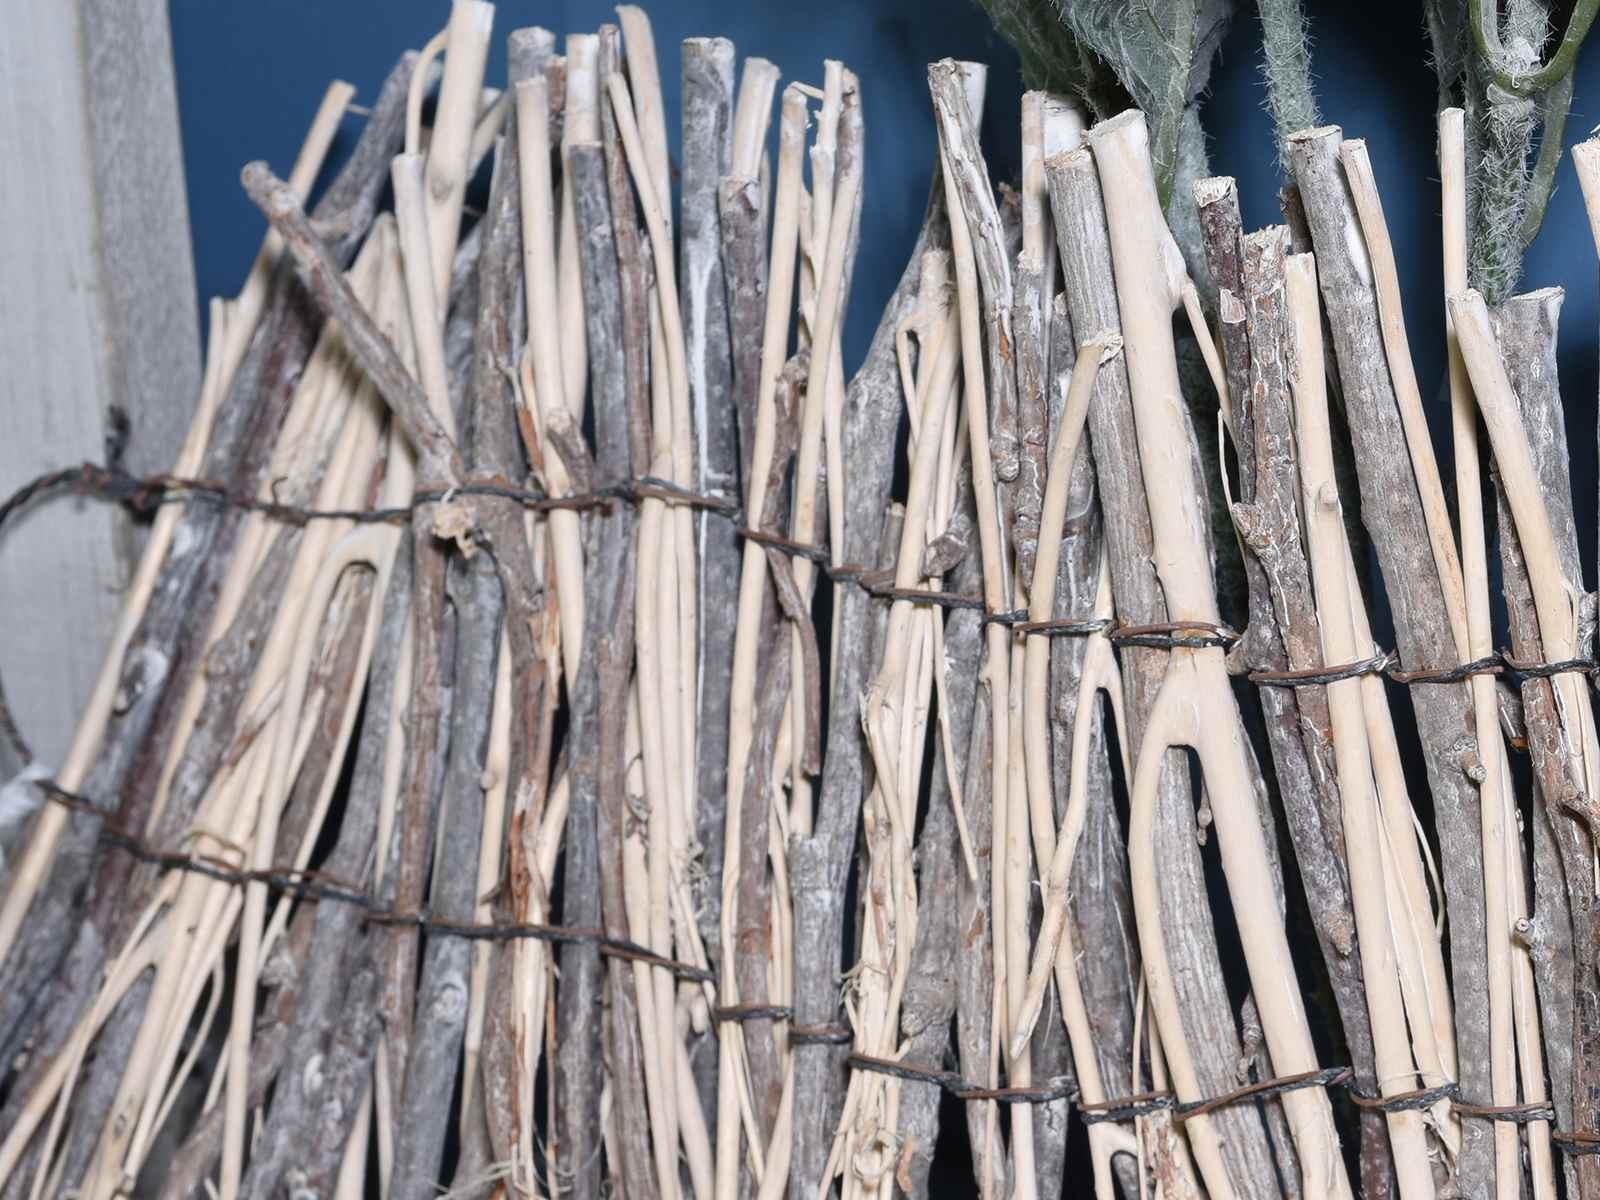 Rami decorativi - Rami di legno decorativi ...